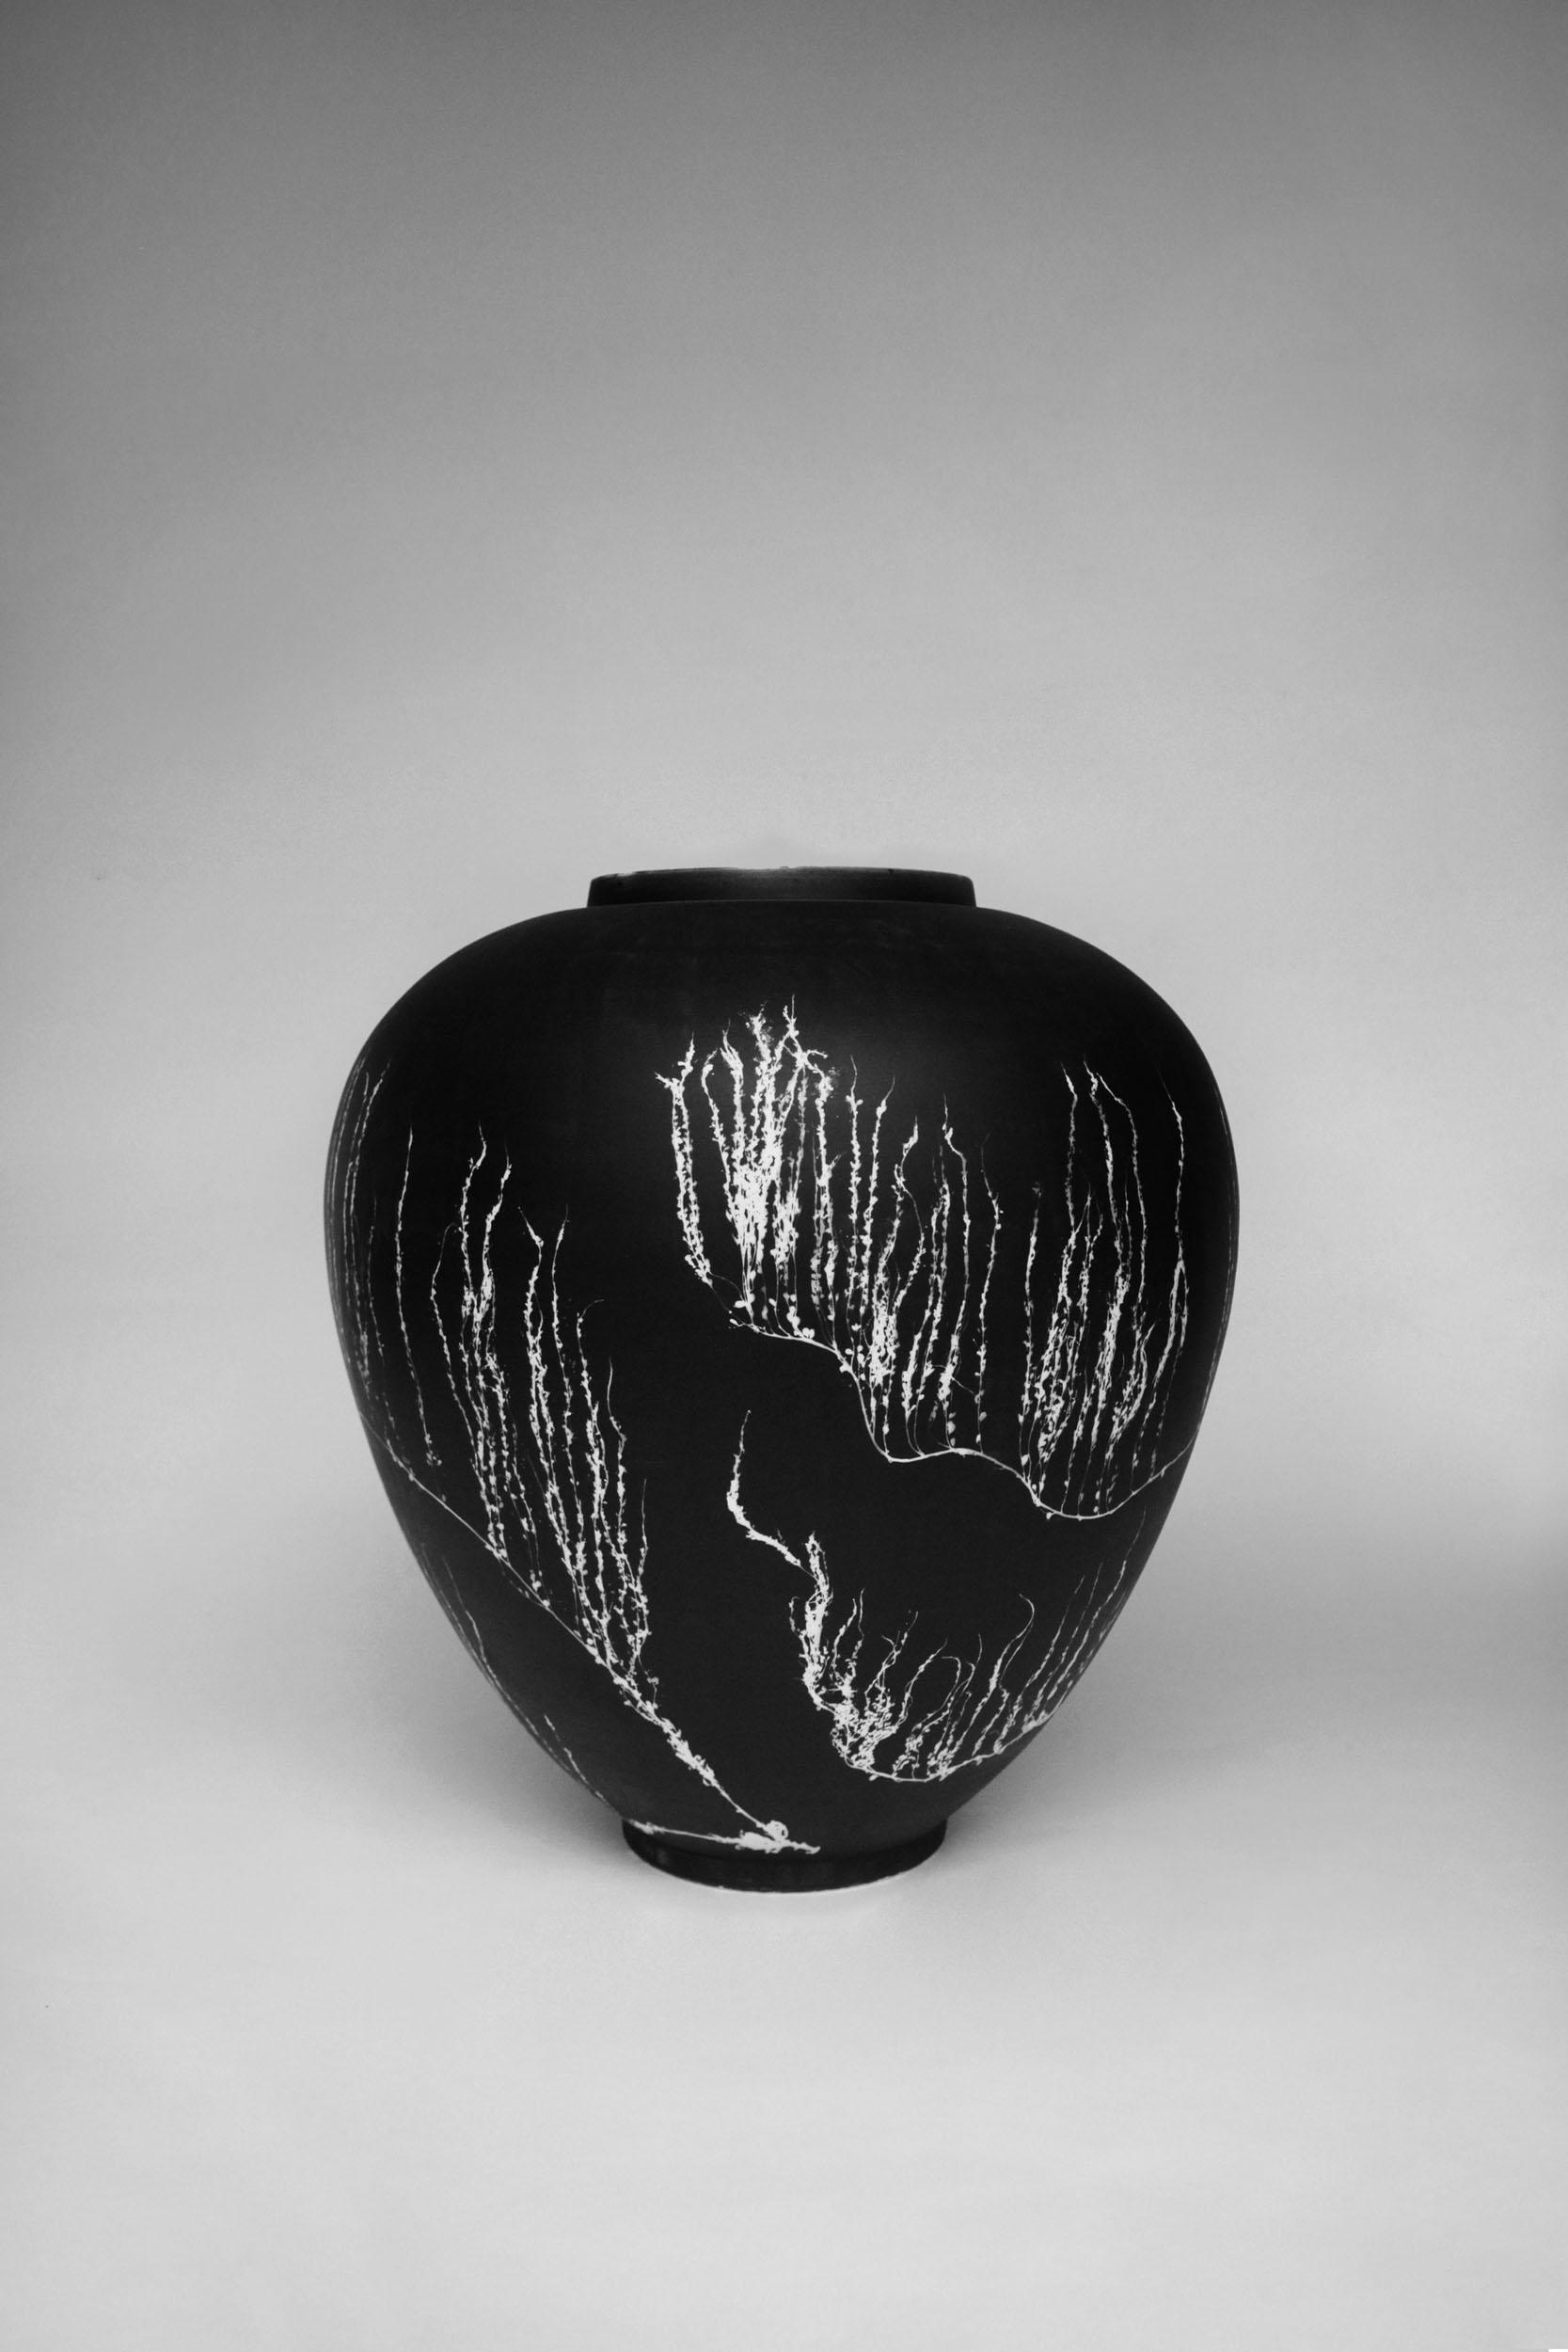 A Silverware vase with foraged seaweed silver gelatin photogram